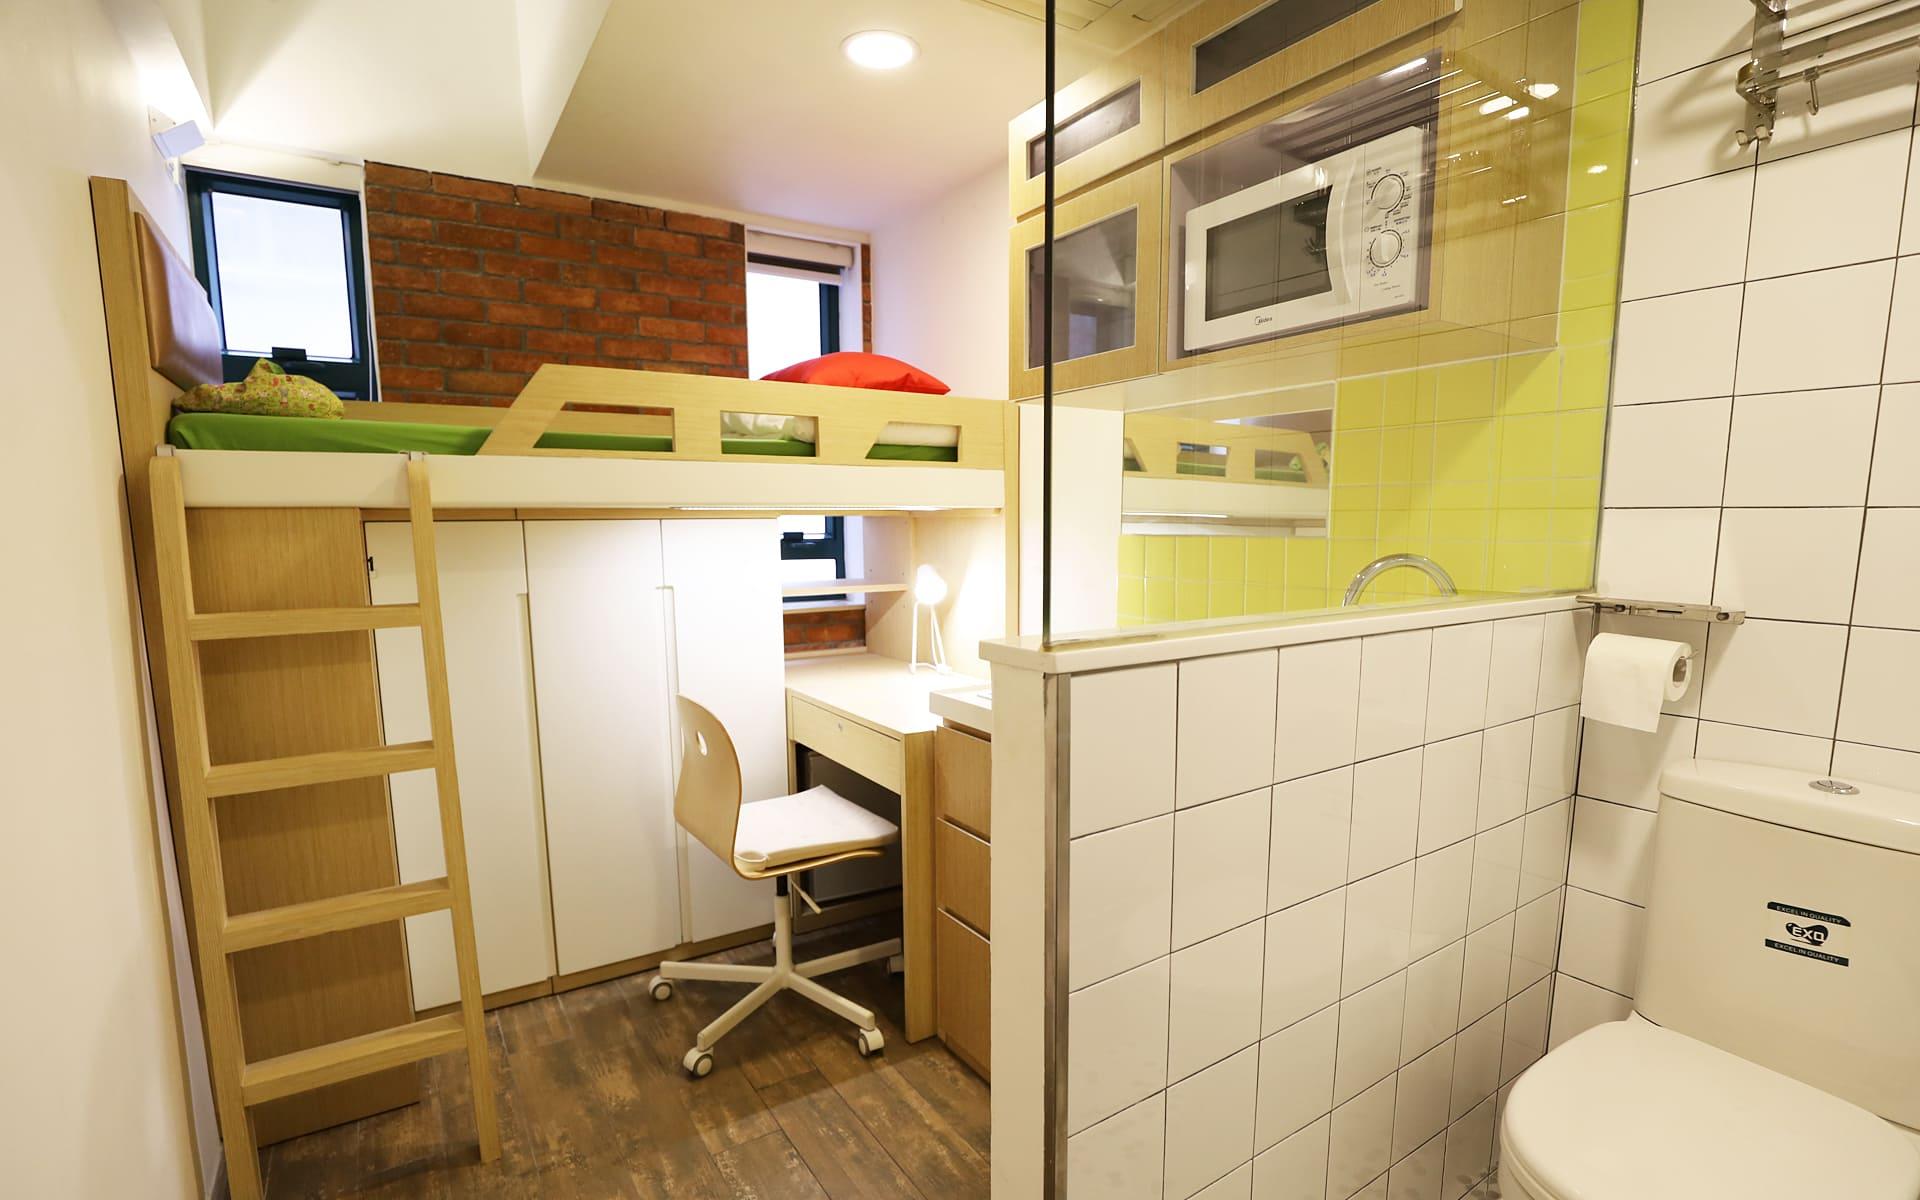 hk_service_apartment_20599862701583918728.jpg